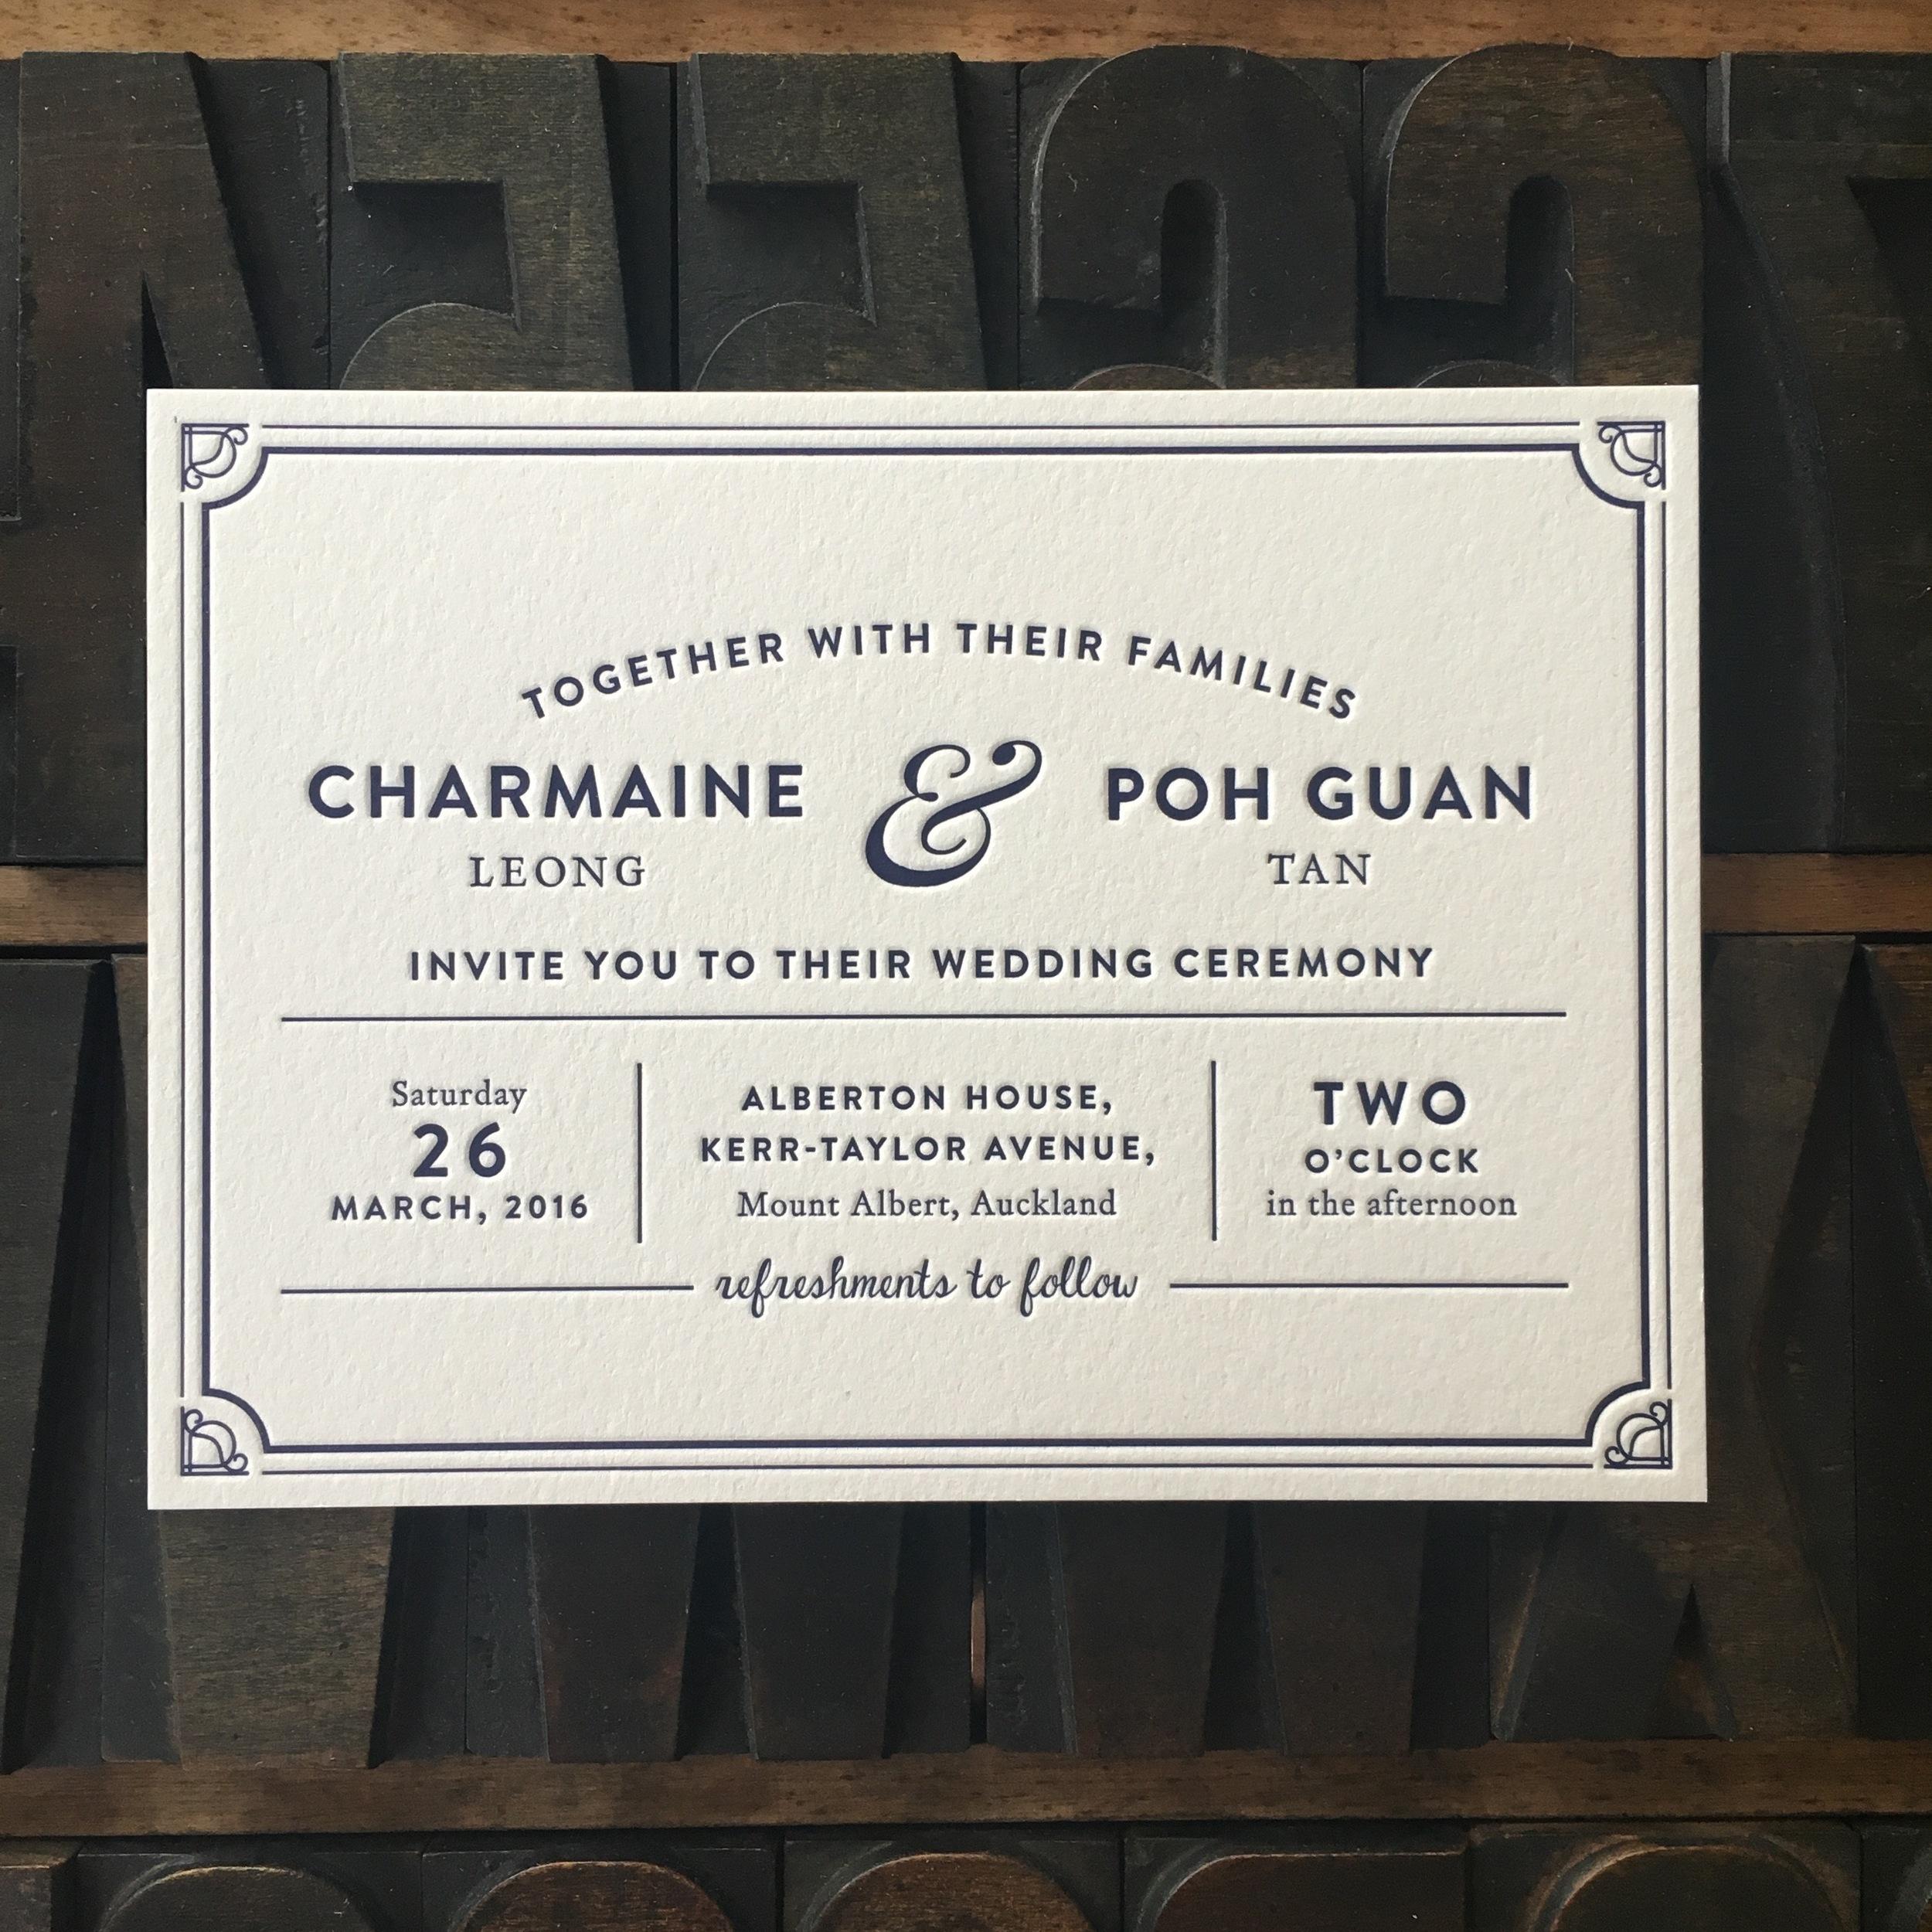 Charmaine & Poh Guan